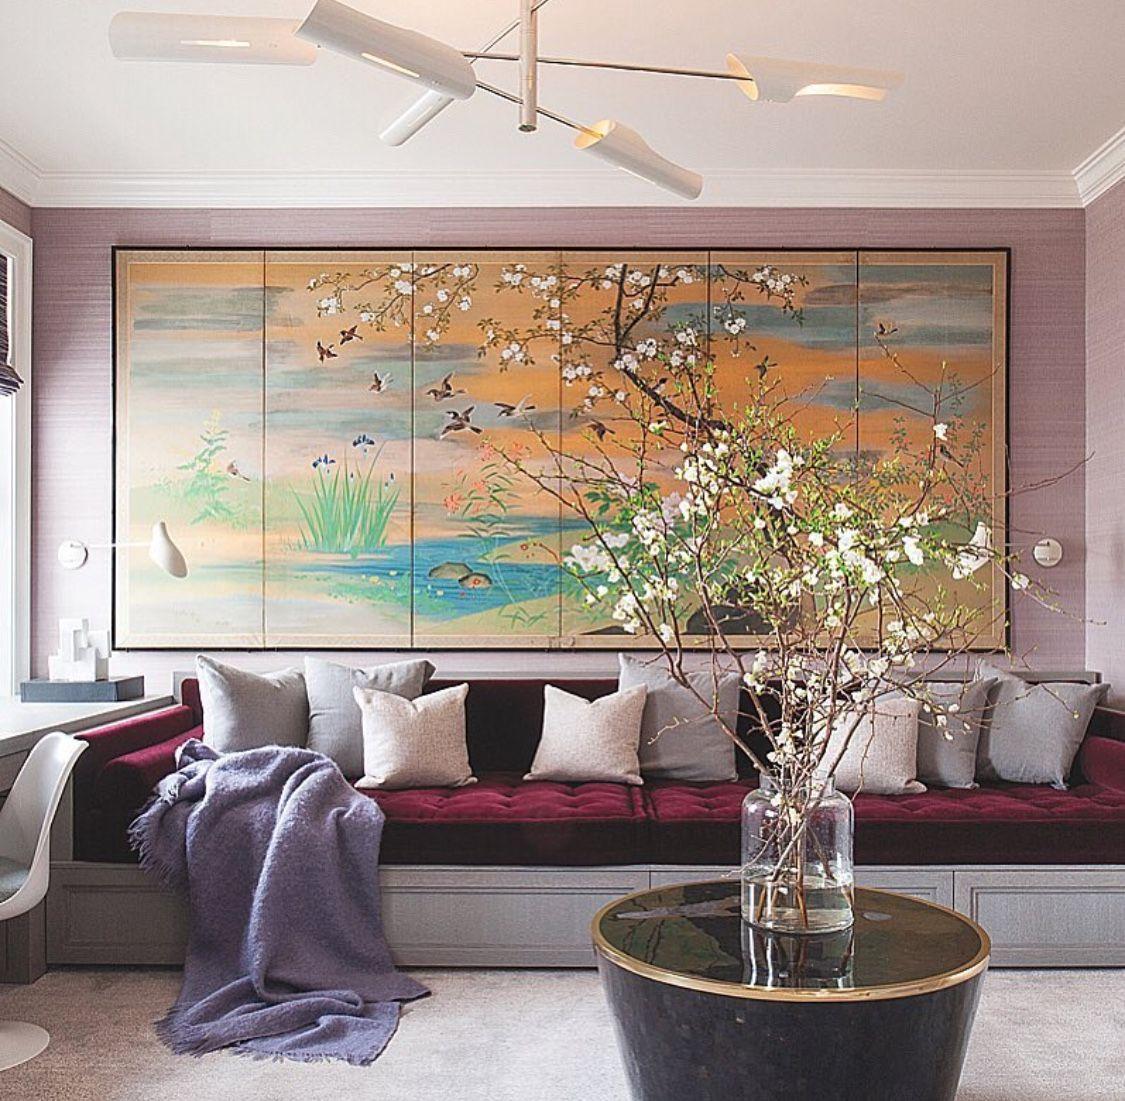 Pin by Sikirin Chaina on Art & Interior Design   Pinterest   Art ...